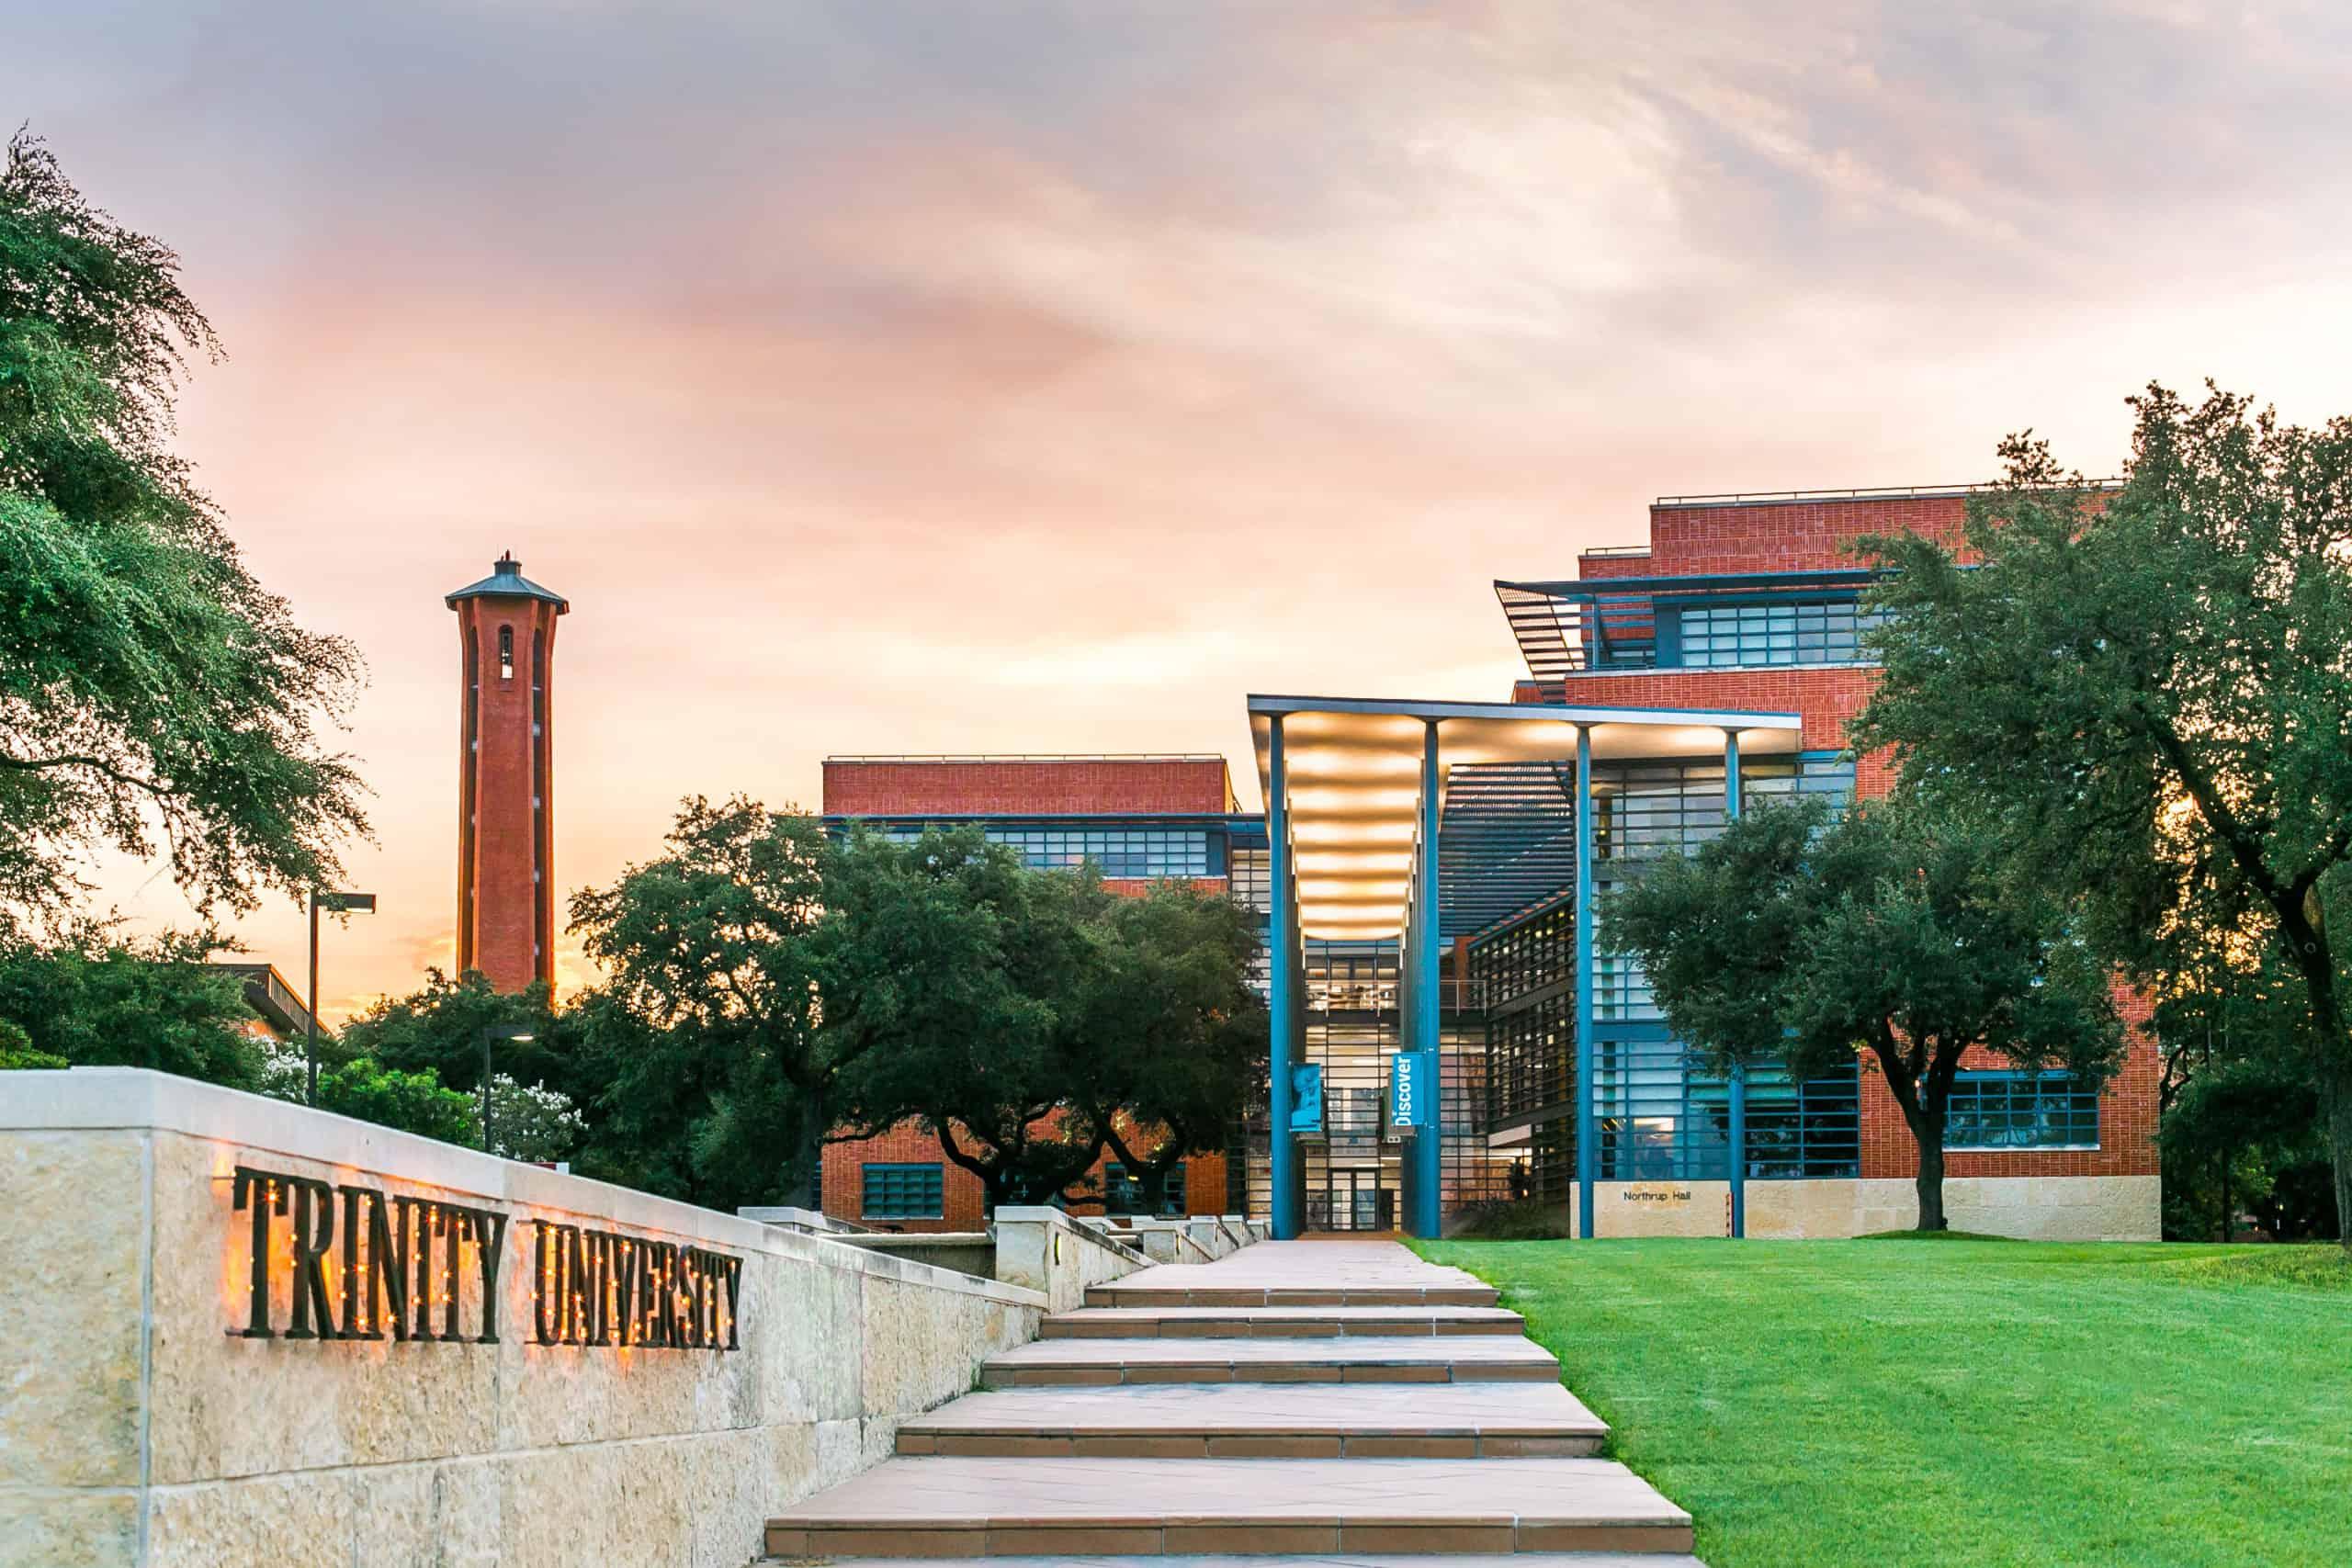 Best_Liberal_Arts_Universities_Trinity_University